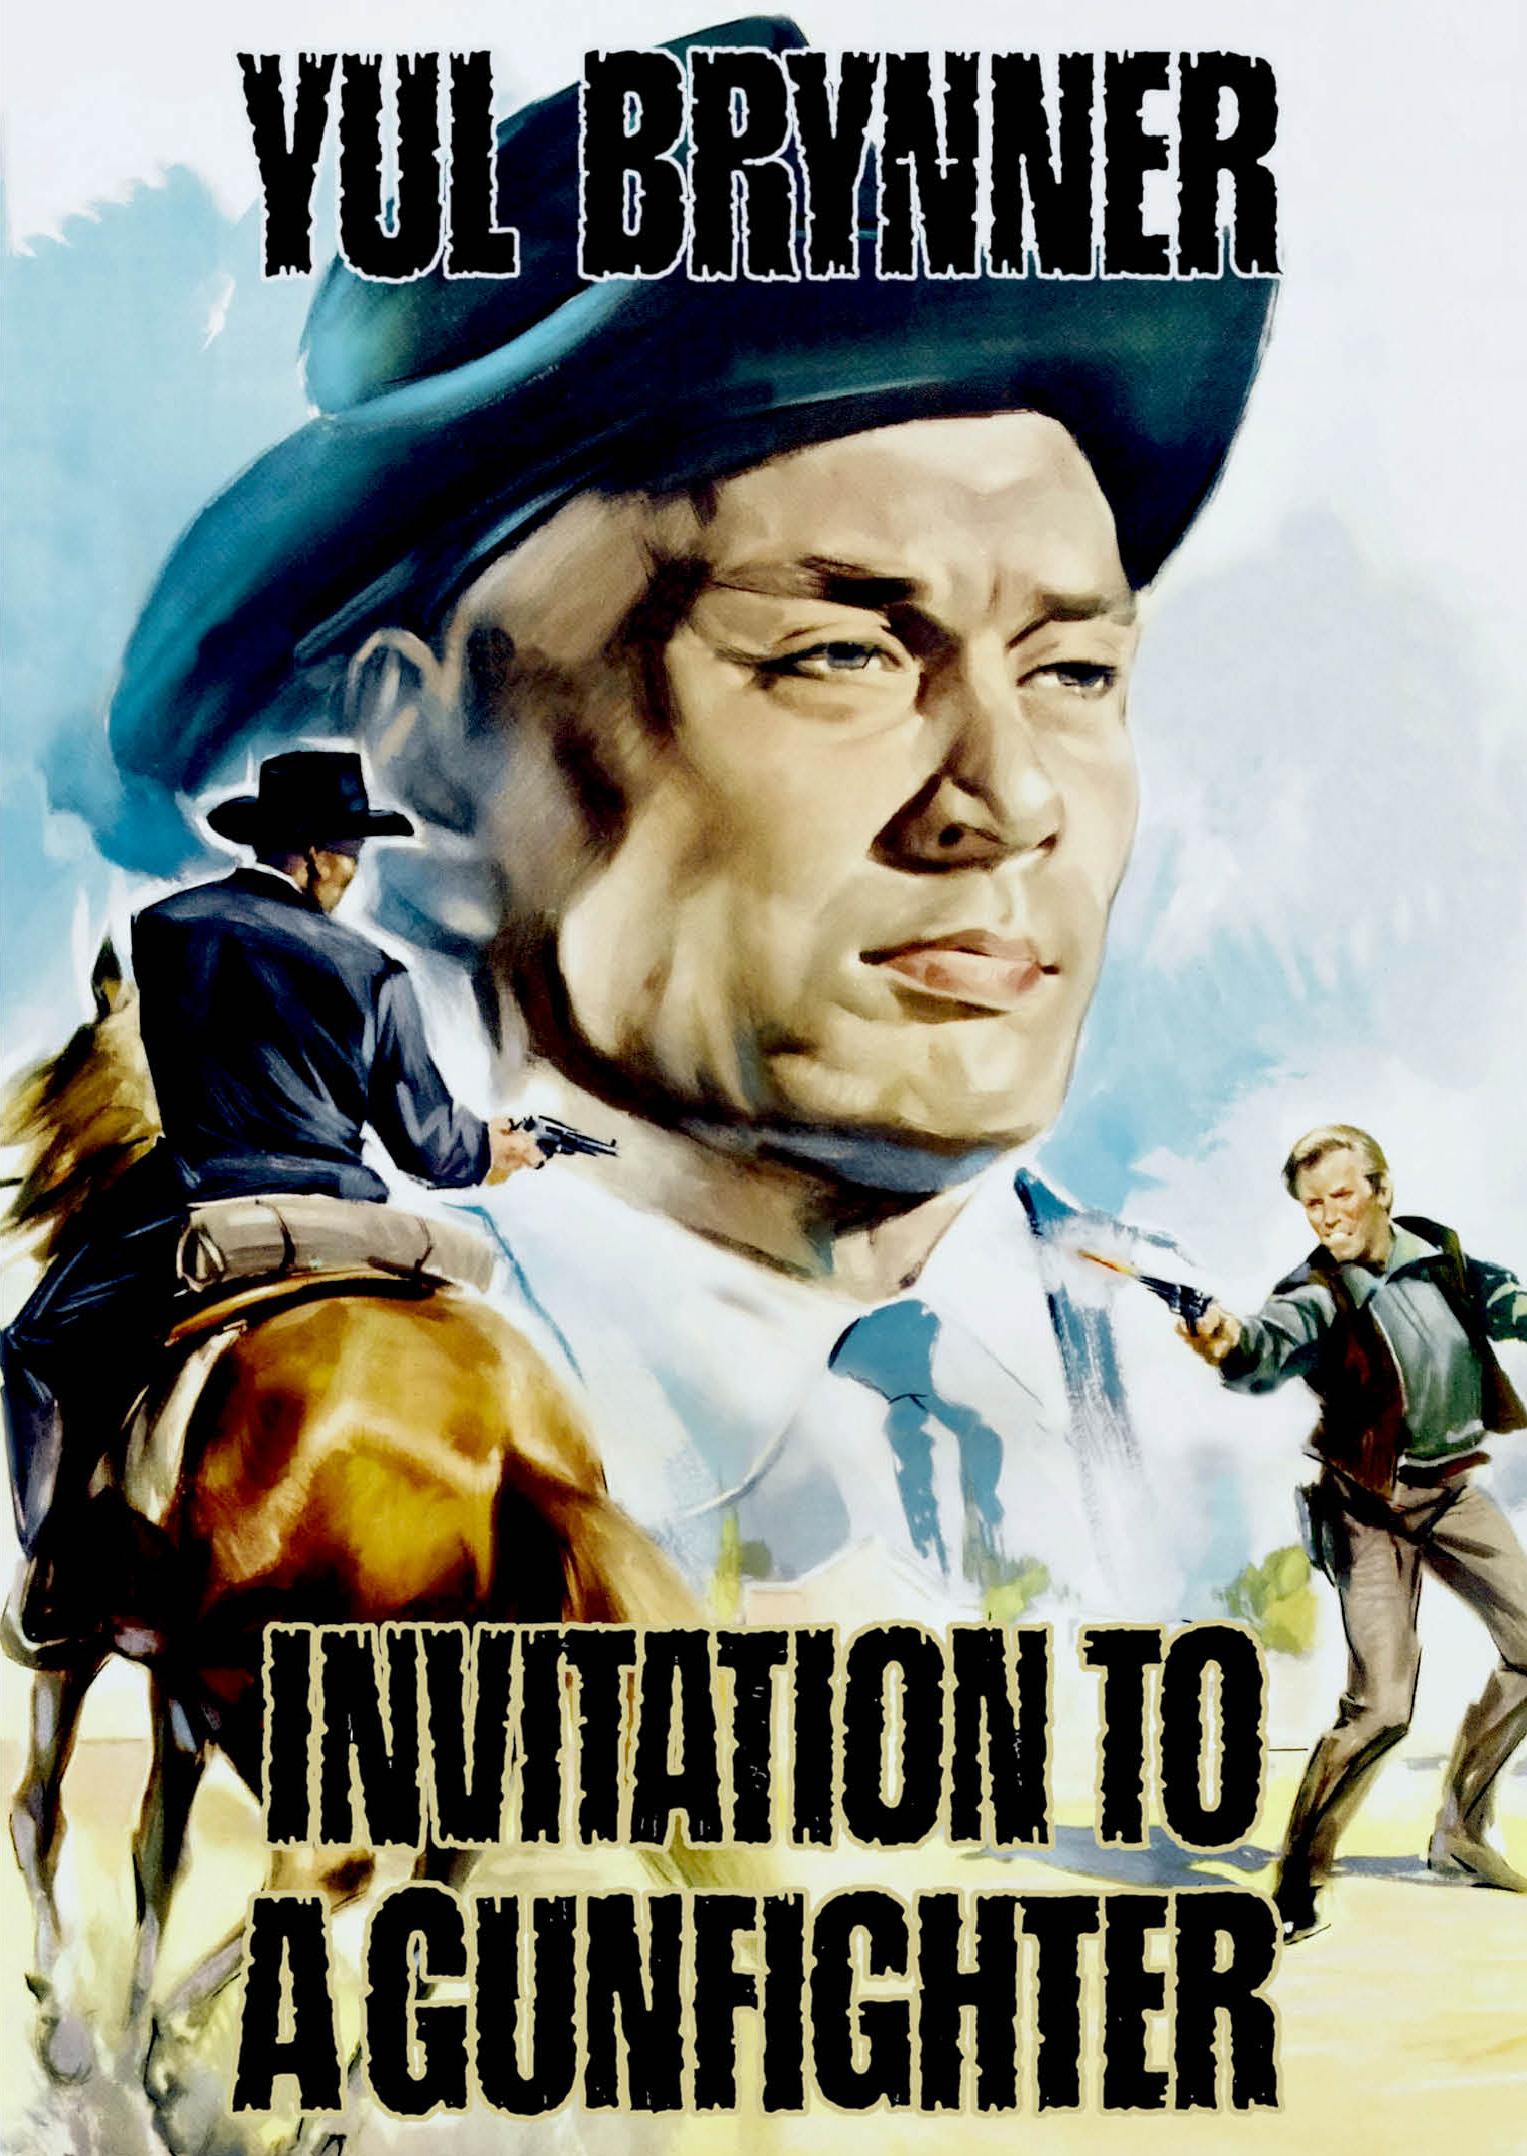 Invitation To A Gunfighter [dvd] [1964] 27412247